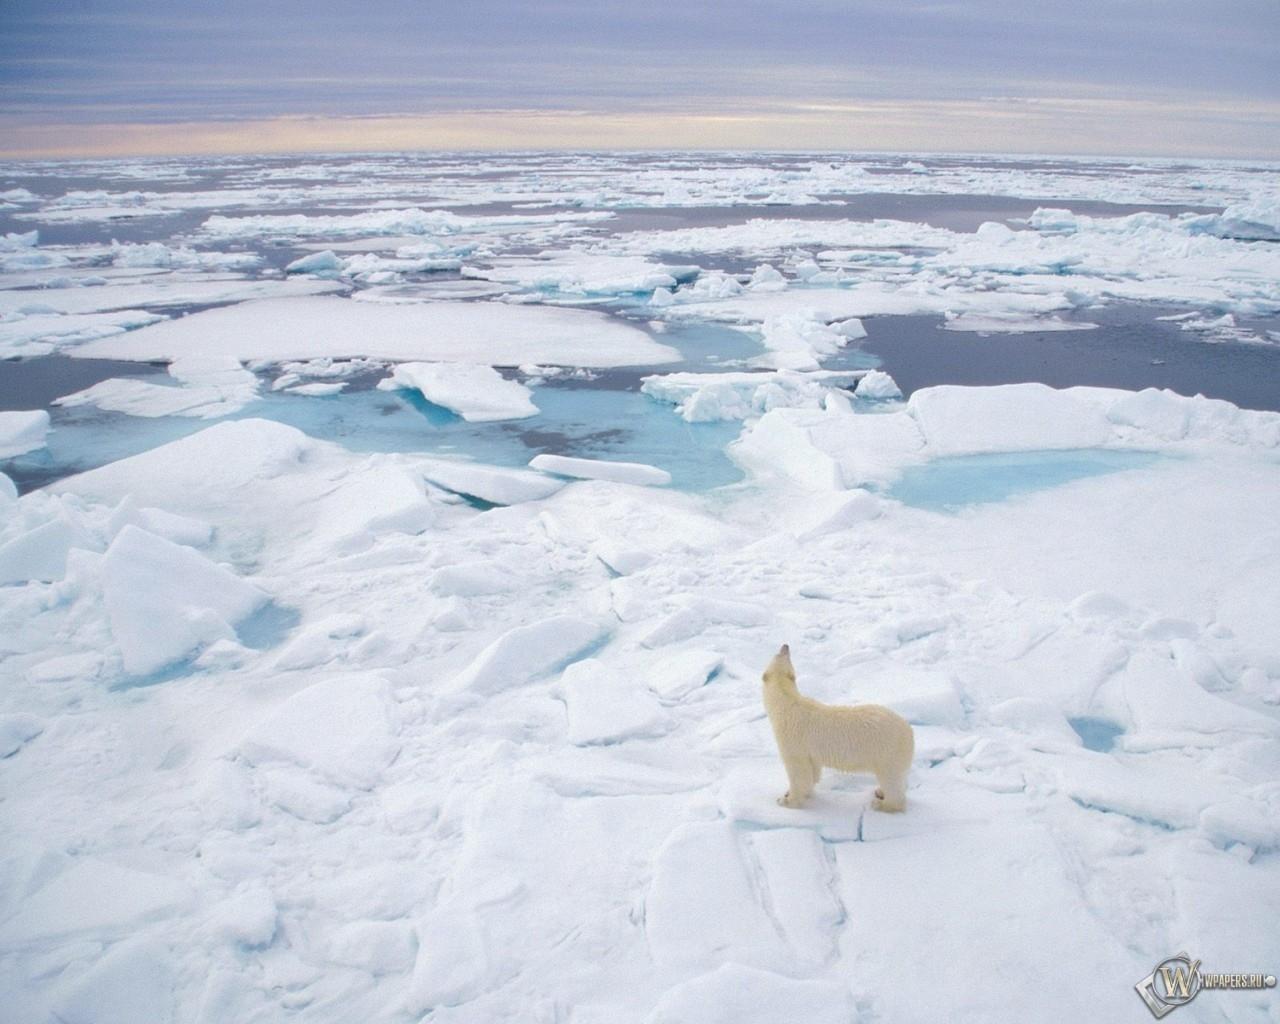 Полярный медведь (Svalbard Norway) 1280x1024